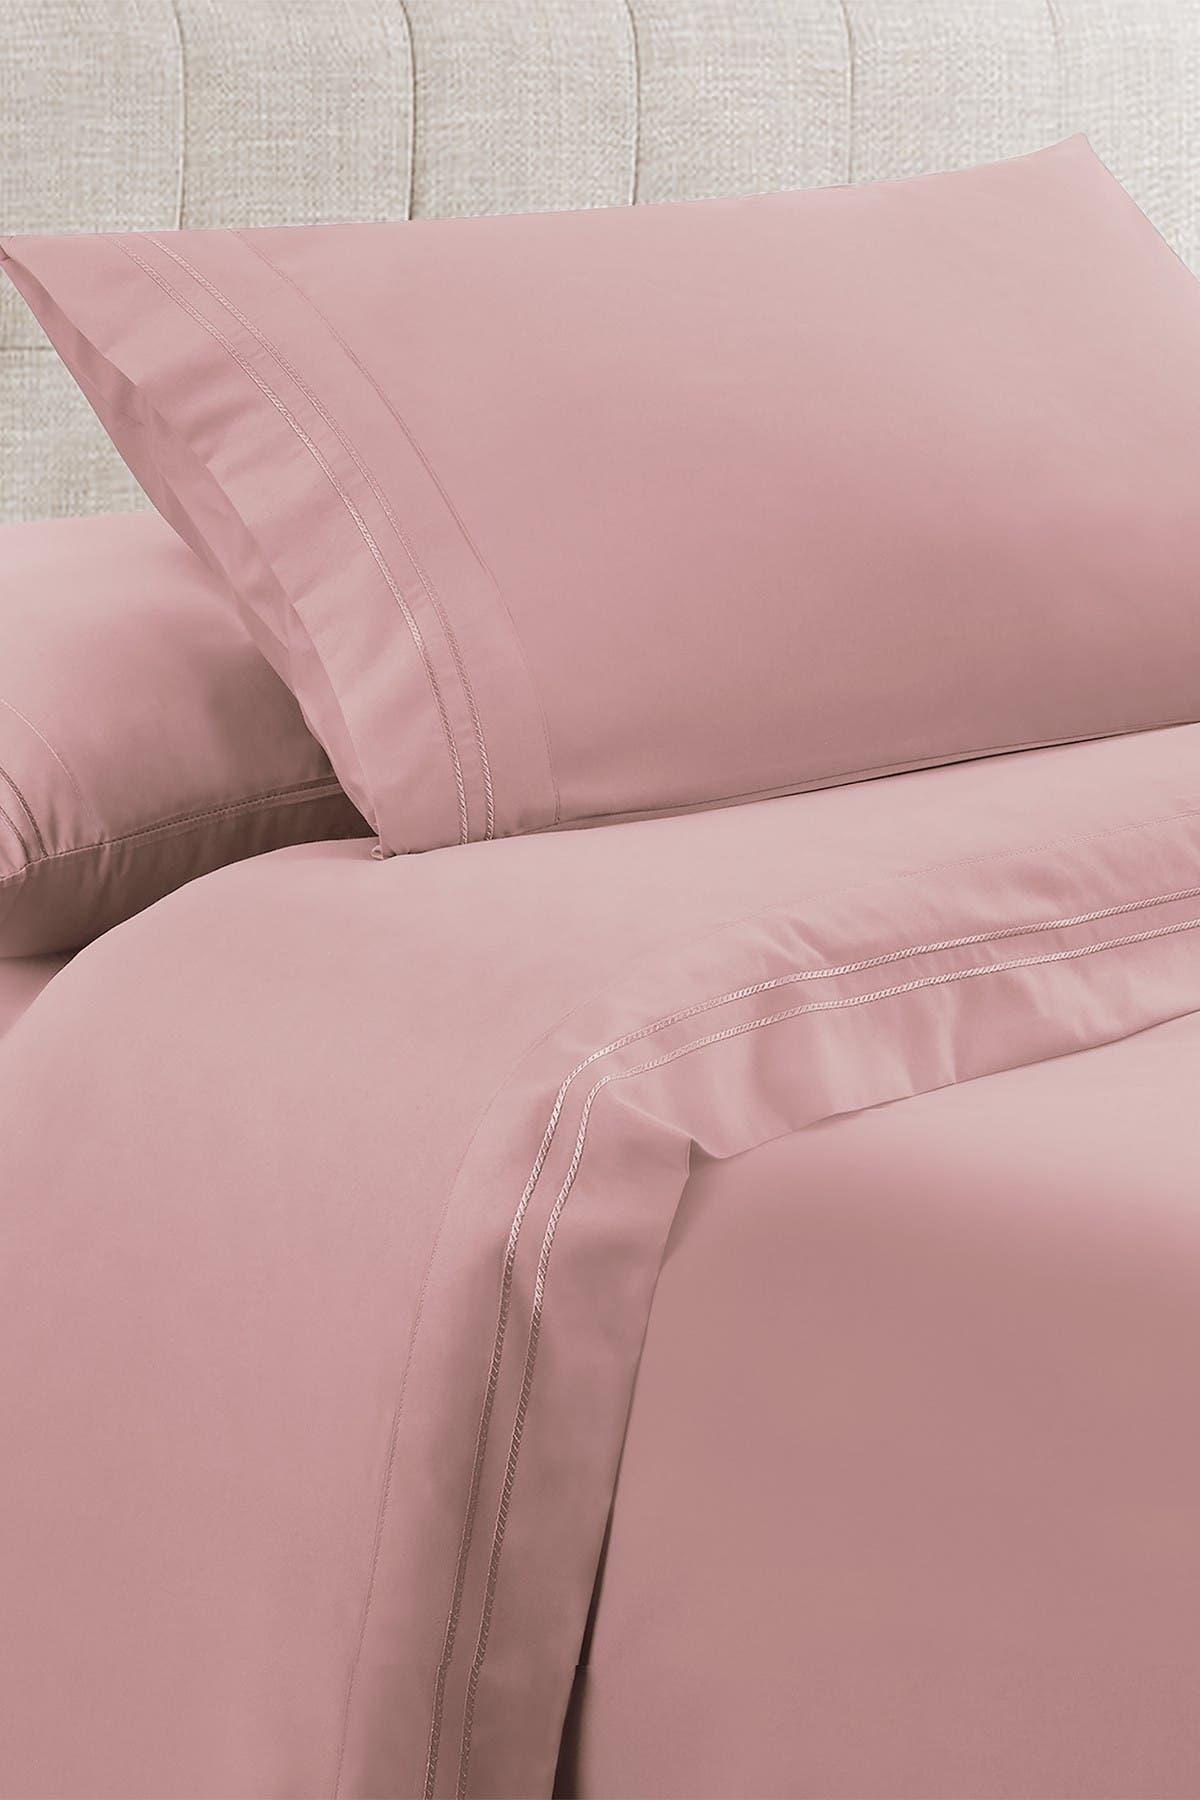 Image of Modern Threads Manor Ridge Luxury 100 GSM Brushed Microfiber Extra Soft Hypoallergenic 3-Piece Double Marrow Hem Sheet Set, Blush - Twin